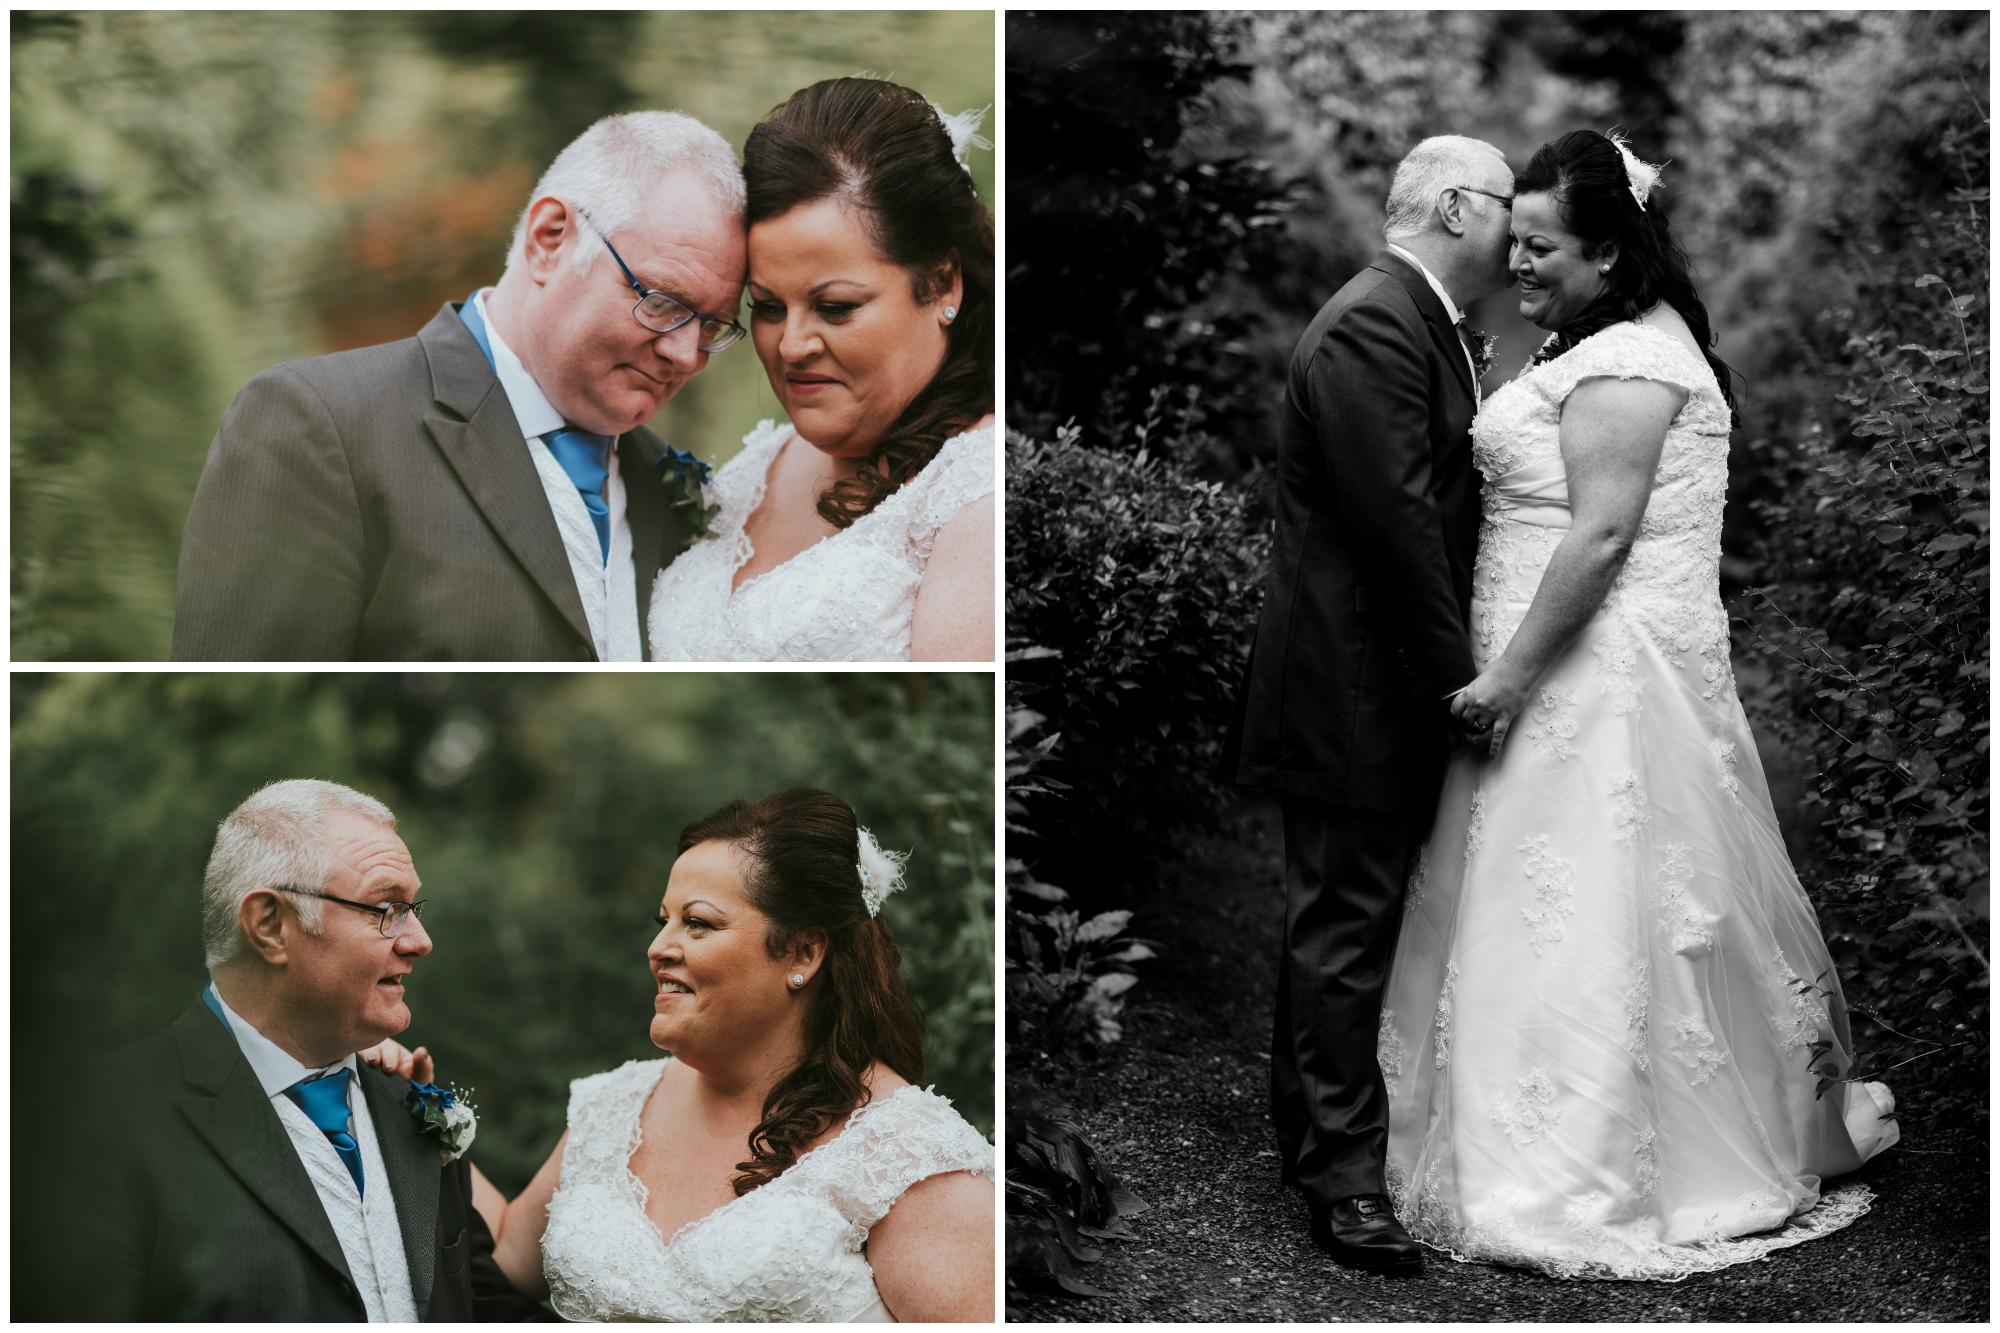 Lady dixon park belfast wedding photographer pure photo n.i bride and groom